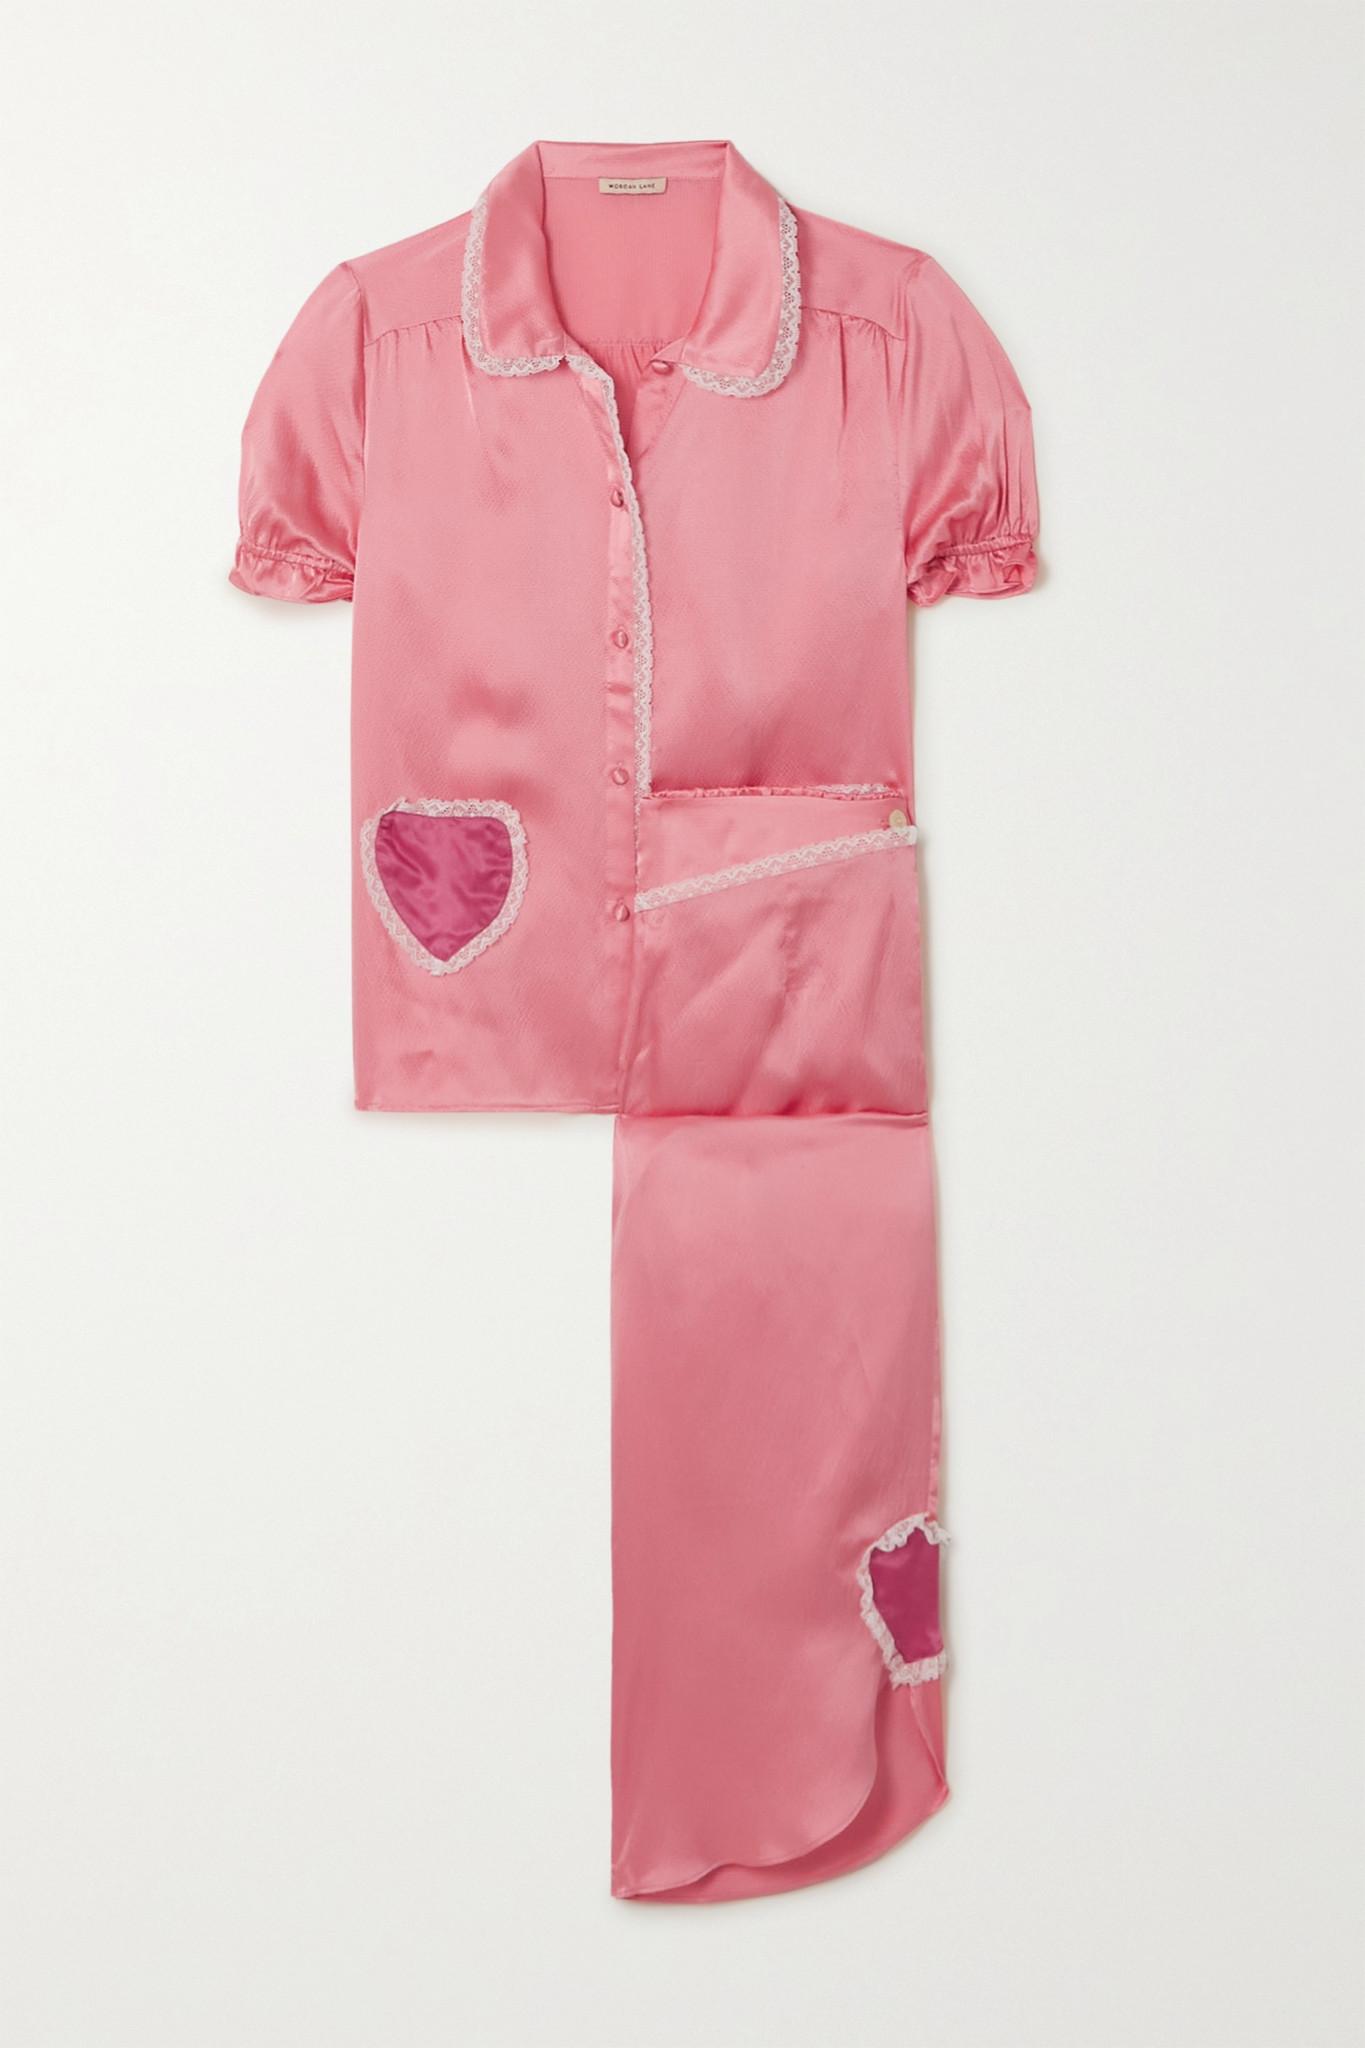 MORGAN LANE - Lovie And Margo Appliquéd Lace-trimmed Hammered Silk-charmeuse Pajama Set - Pink - med